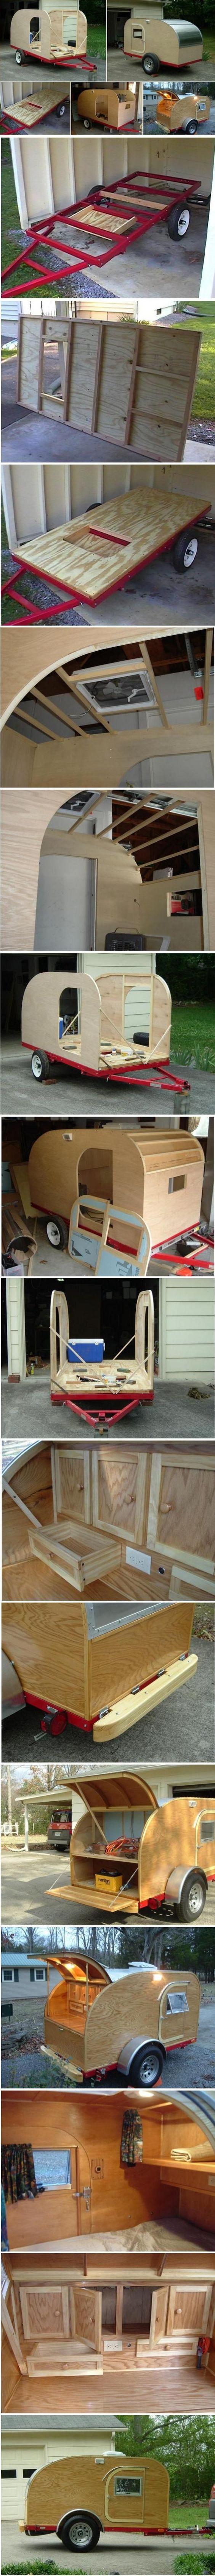 Construction dune mini caravane ou teardrop trailer. | How Do It Info